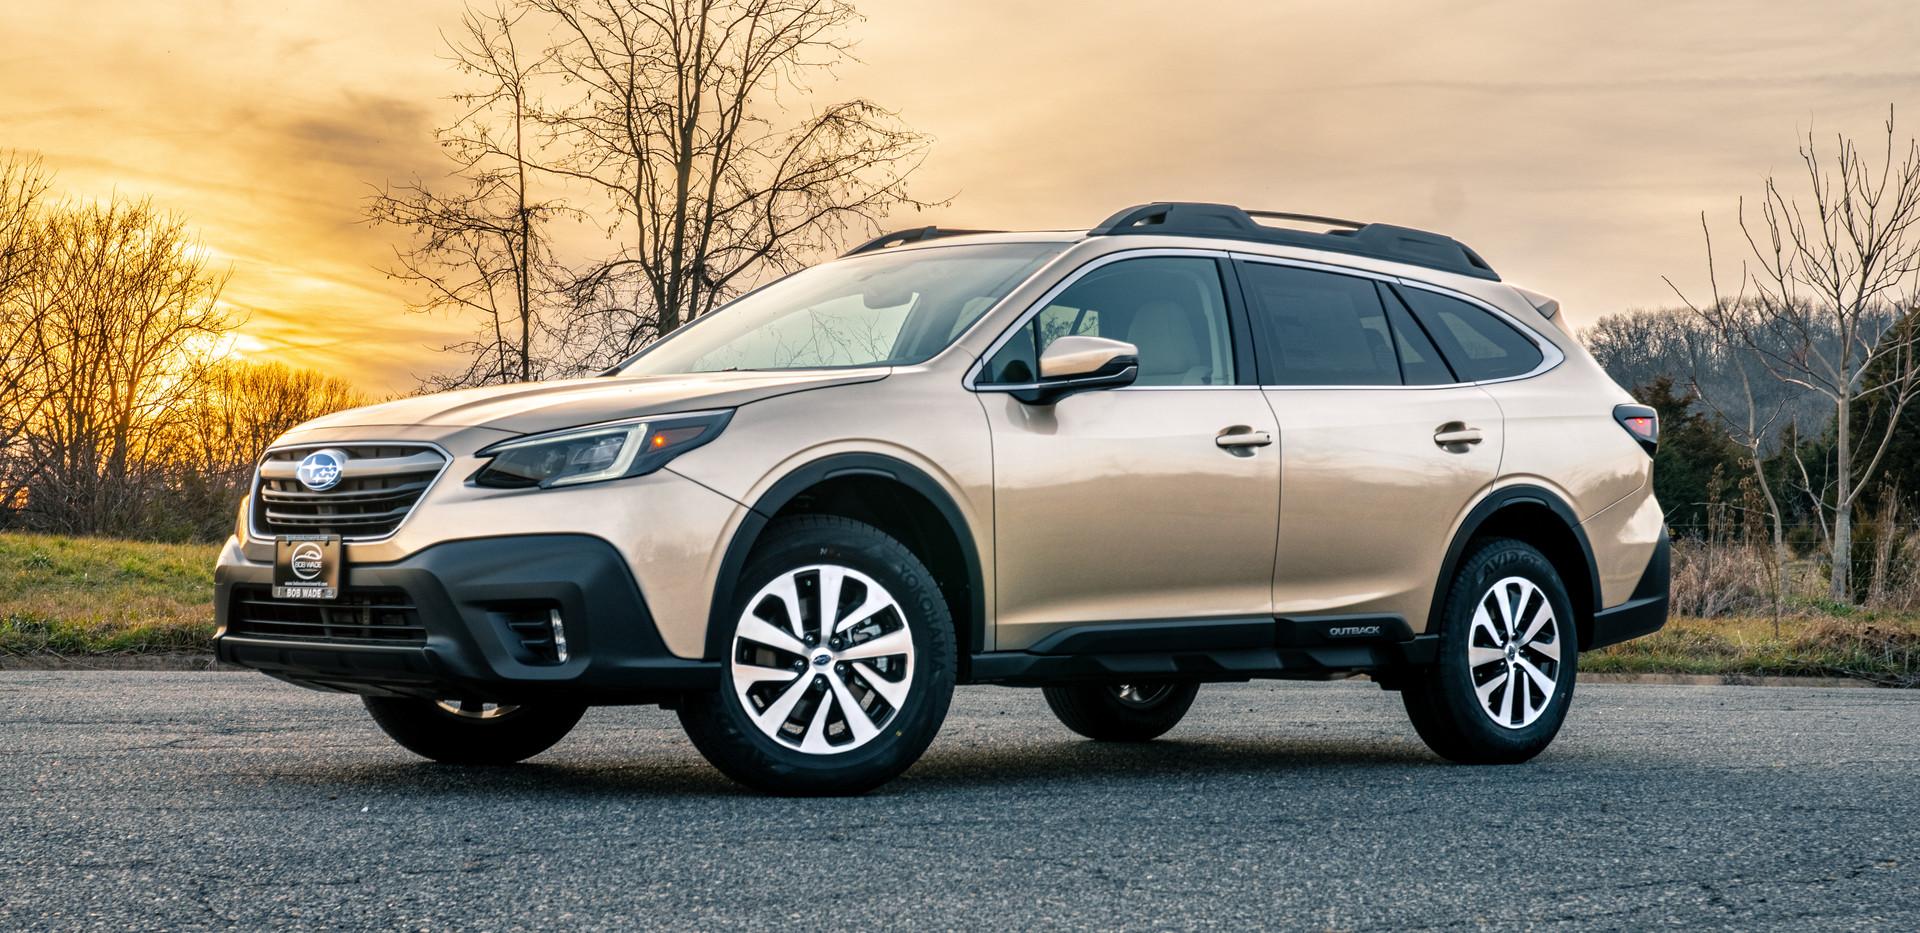 2020 Subaru Outback Tungsten.jpg